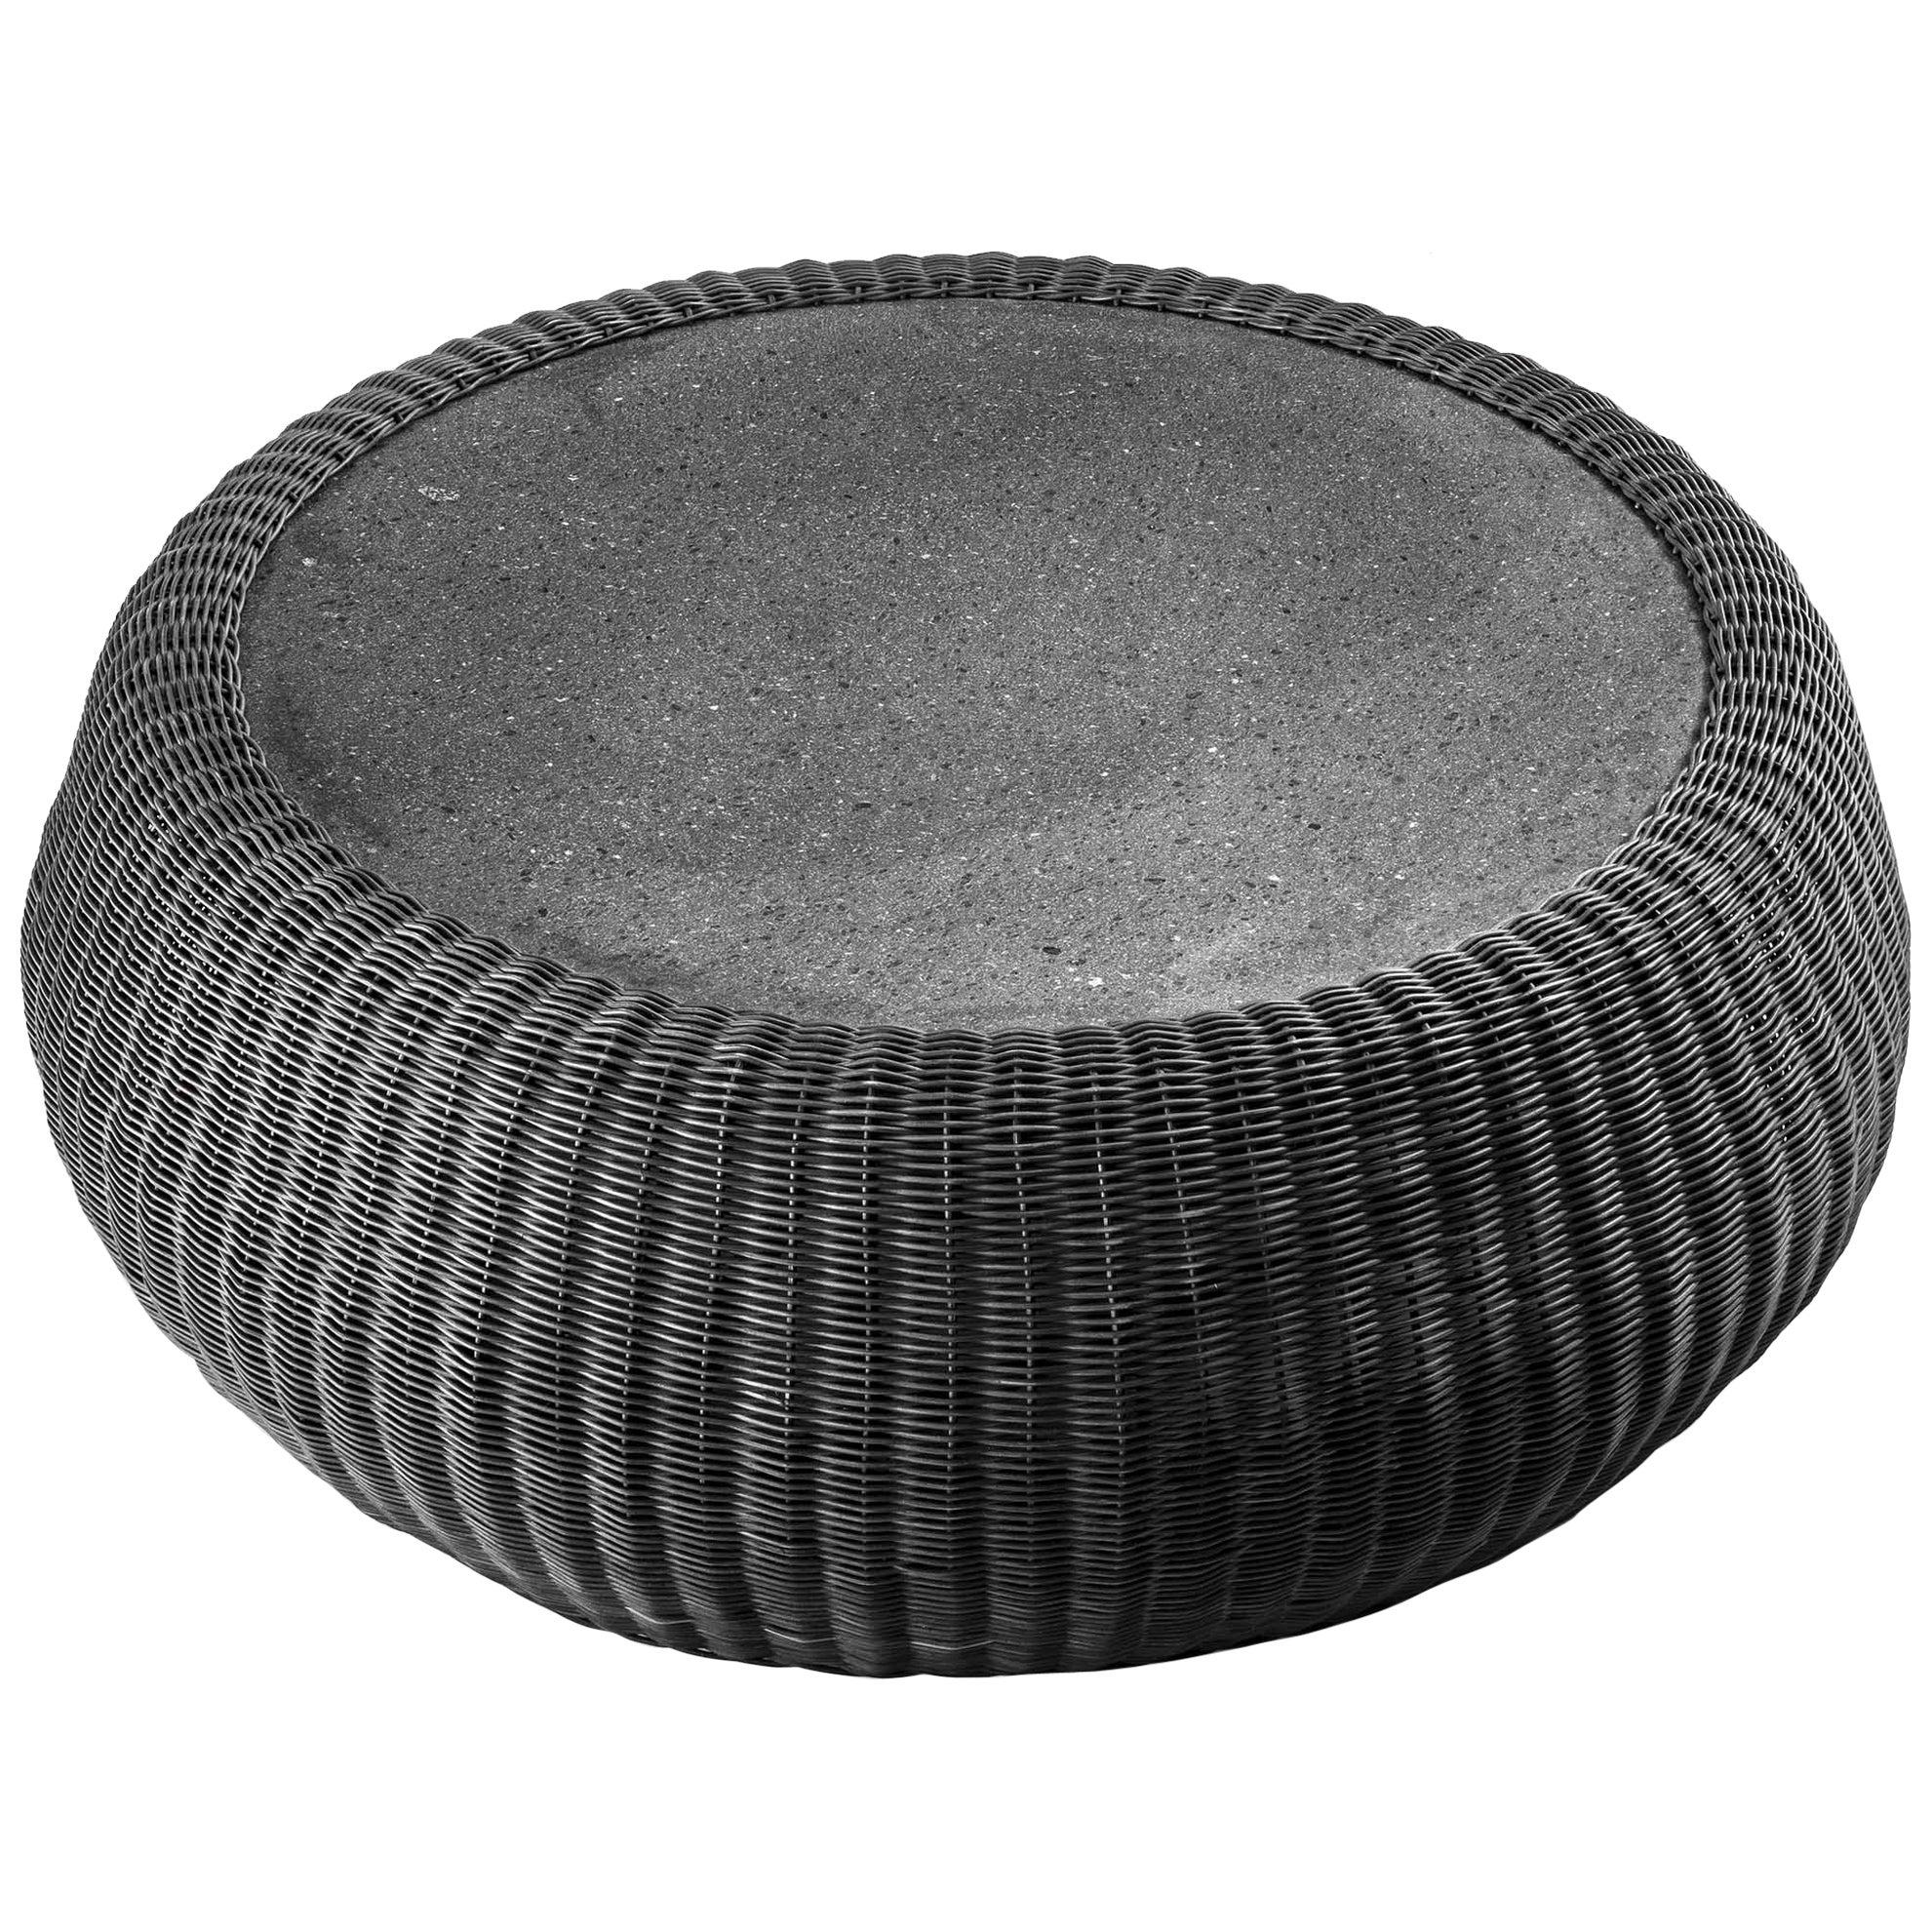 "Lava Stone ""Amazonas"" Coffee Table, Giorgio Bonaguro"